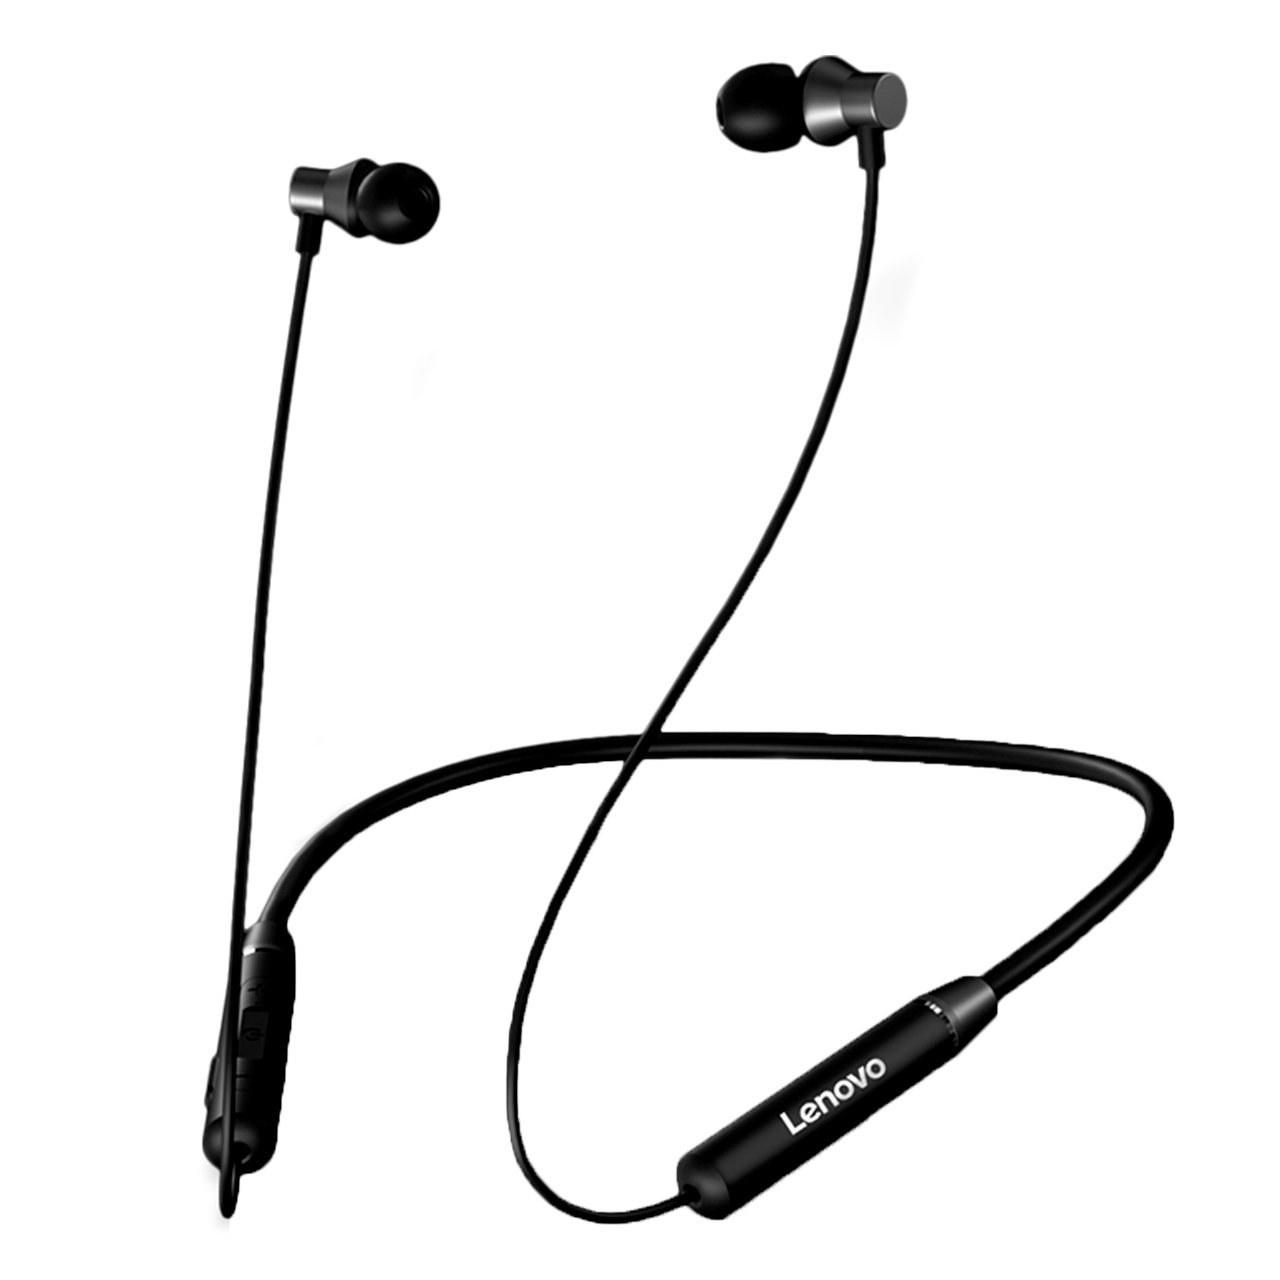 عکس هدفون بی سیم لنوو مدل HE05 Lenovo HE05 Wireless Headphones هدفون-بی-سیم-لنوو-مدل-he05